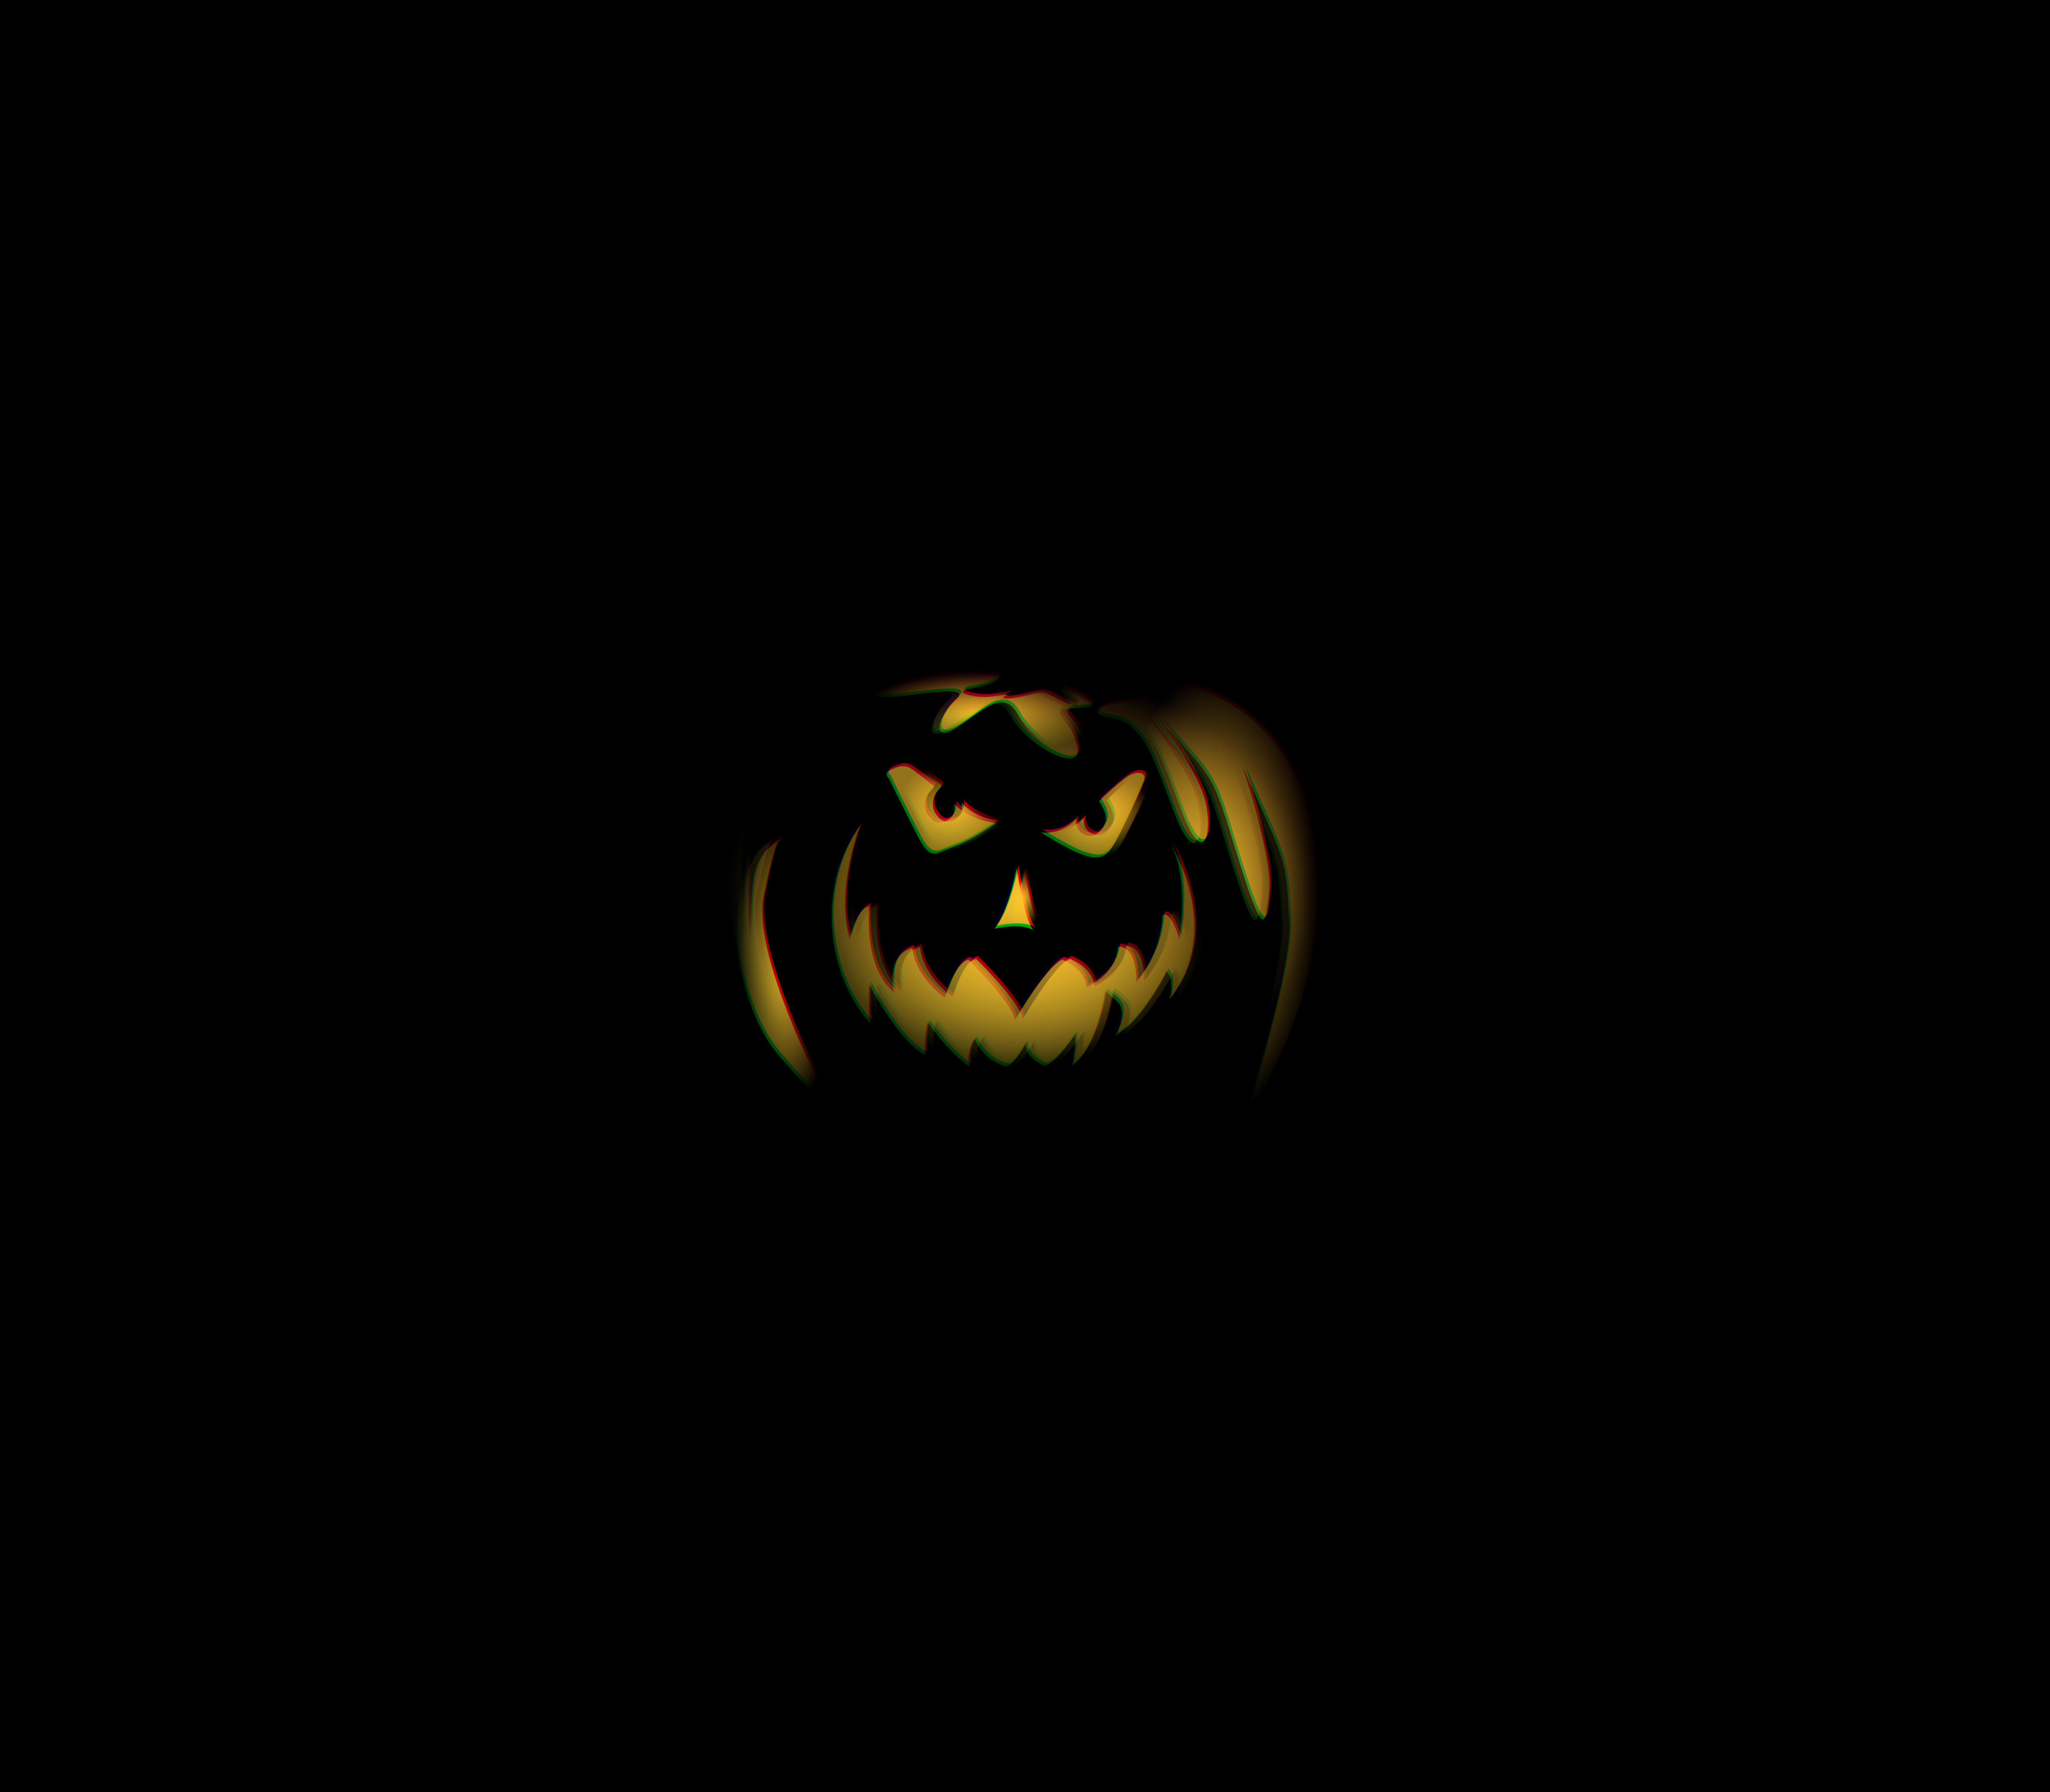 78493 download wallpaper Holidays, Halloween, Pumpkin, Dark, Jack Lamp, Jack's Lamp screensavers and pictures for free